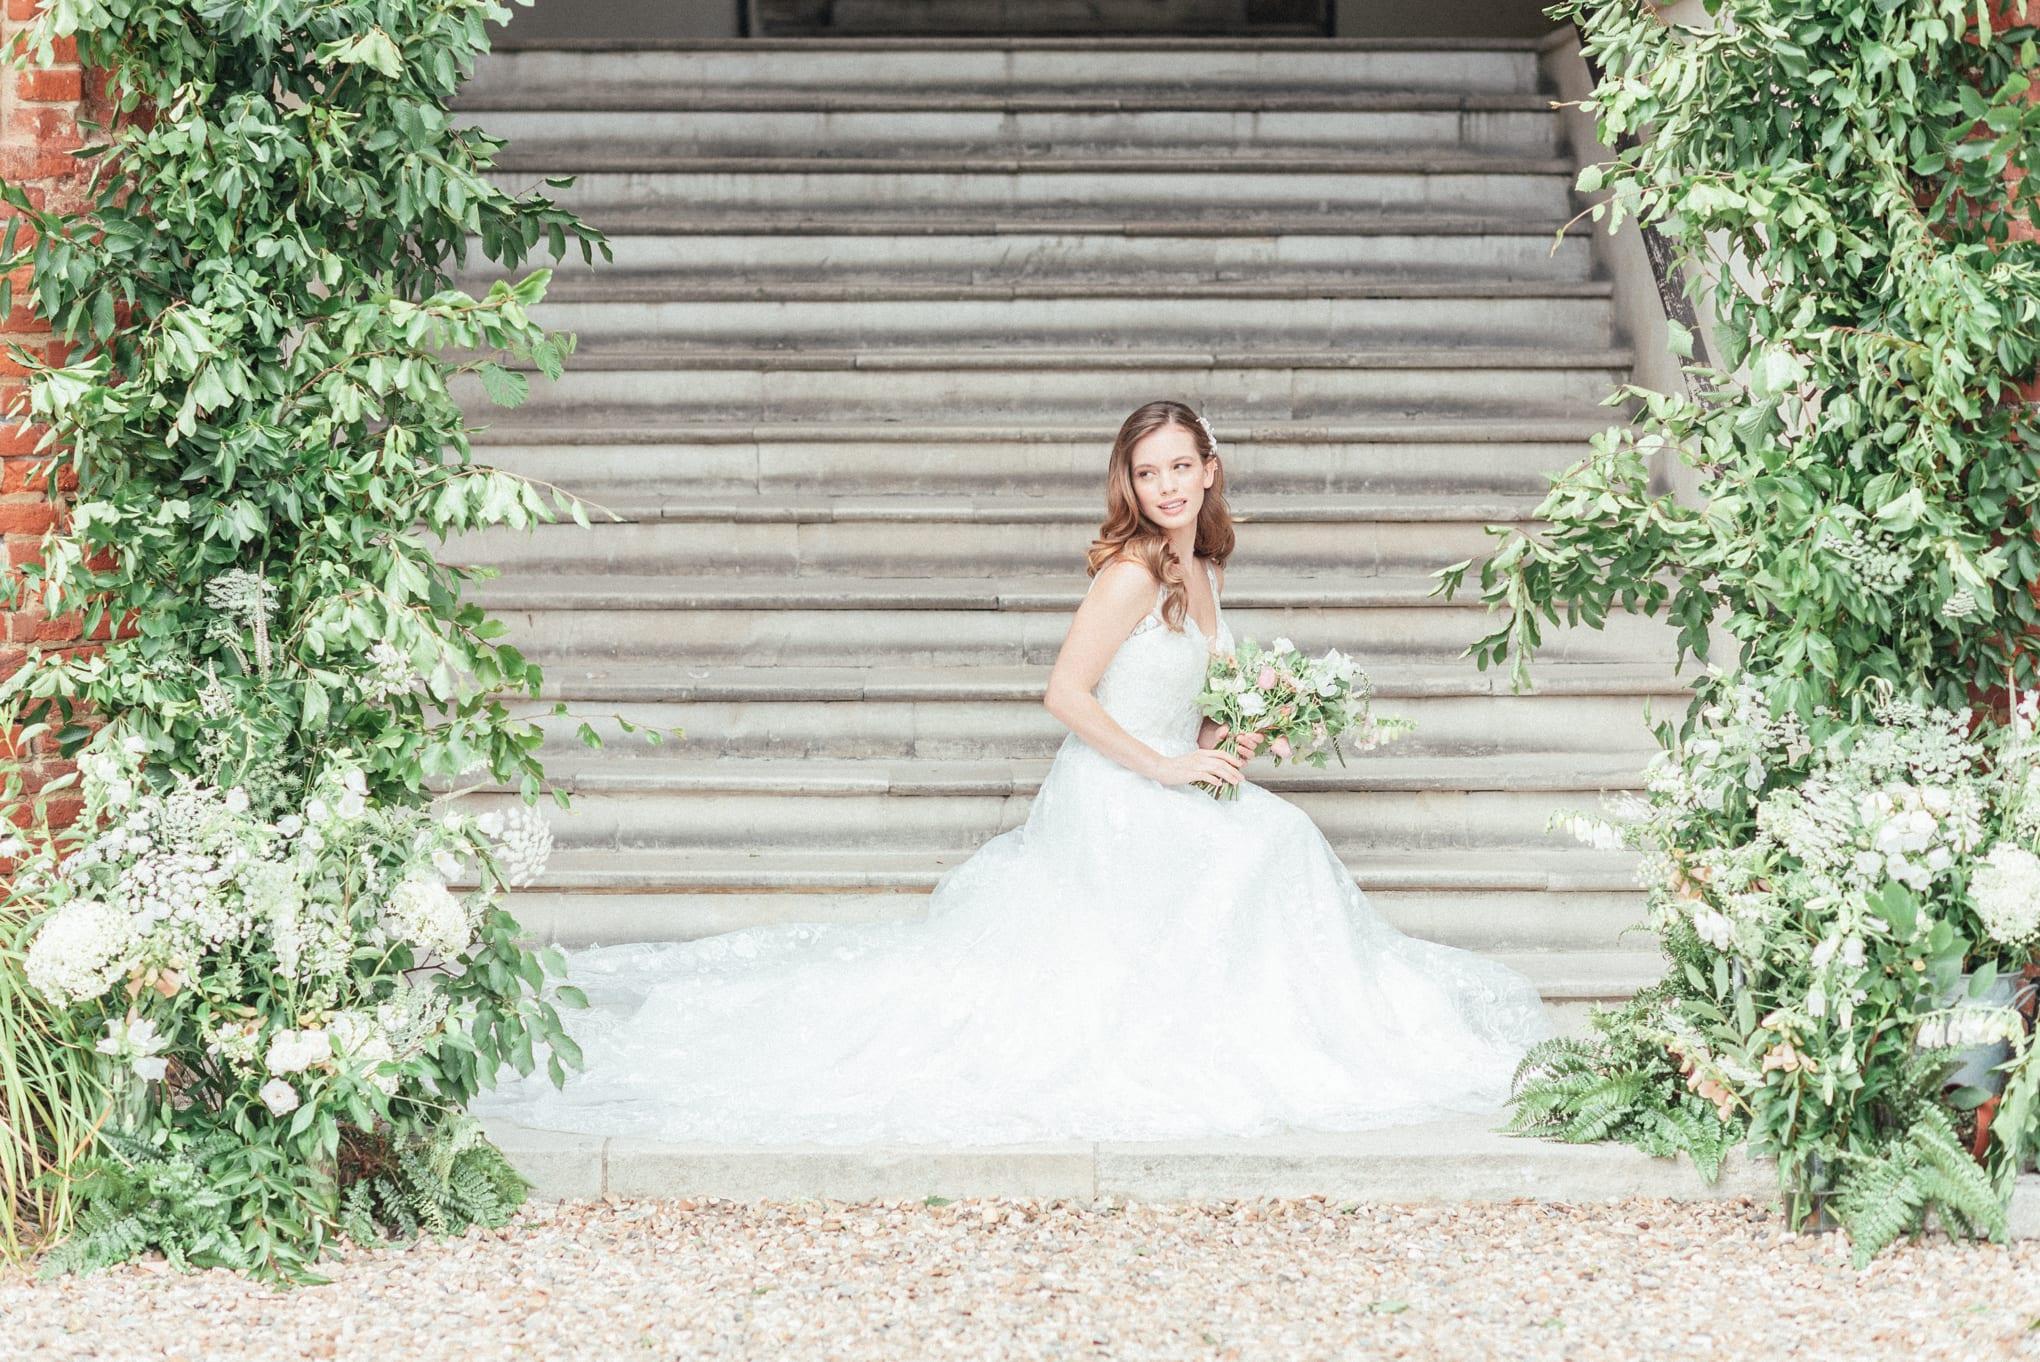 Bridal photography at Farnham Castle in Surrey